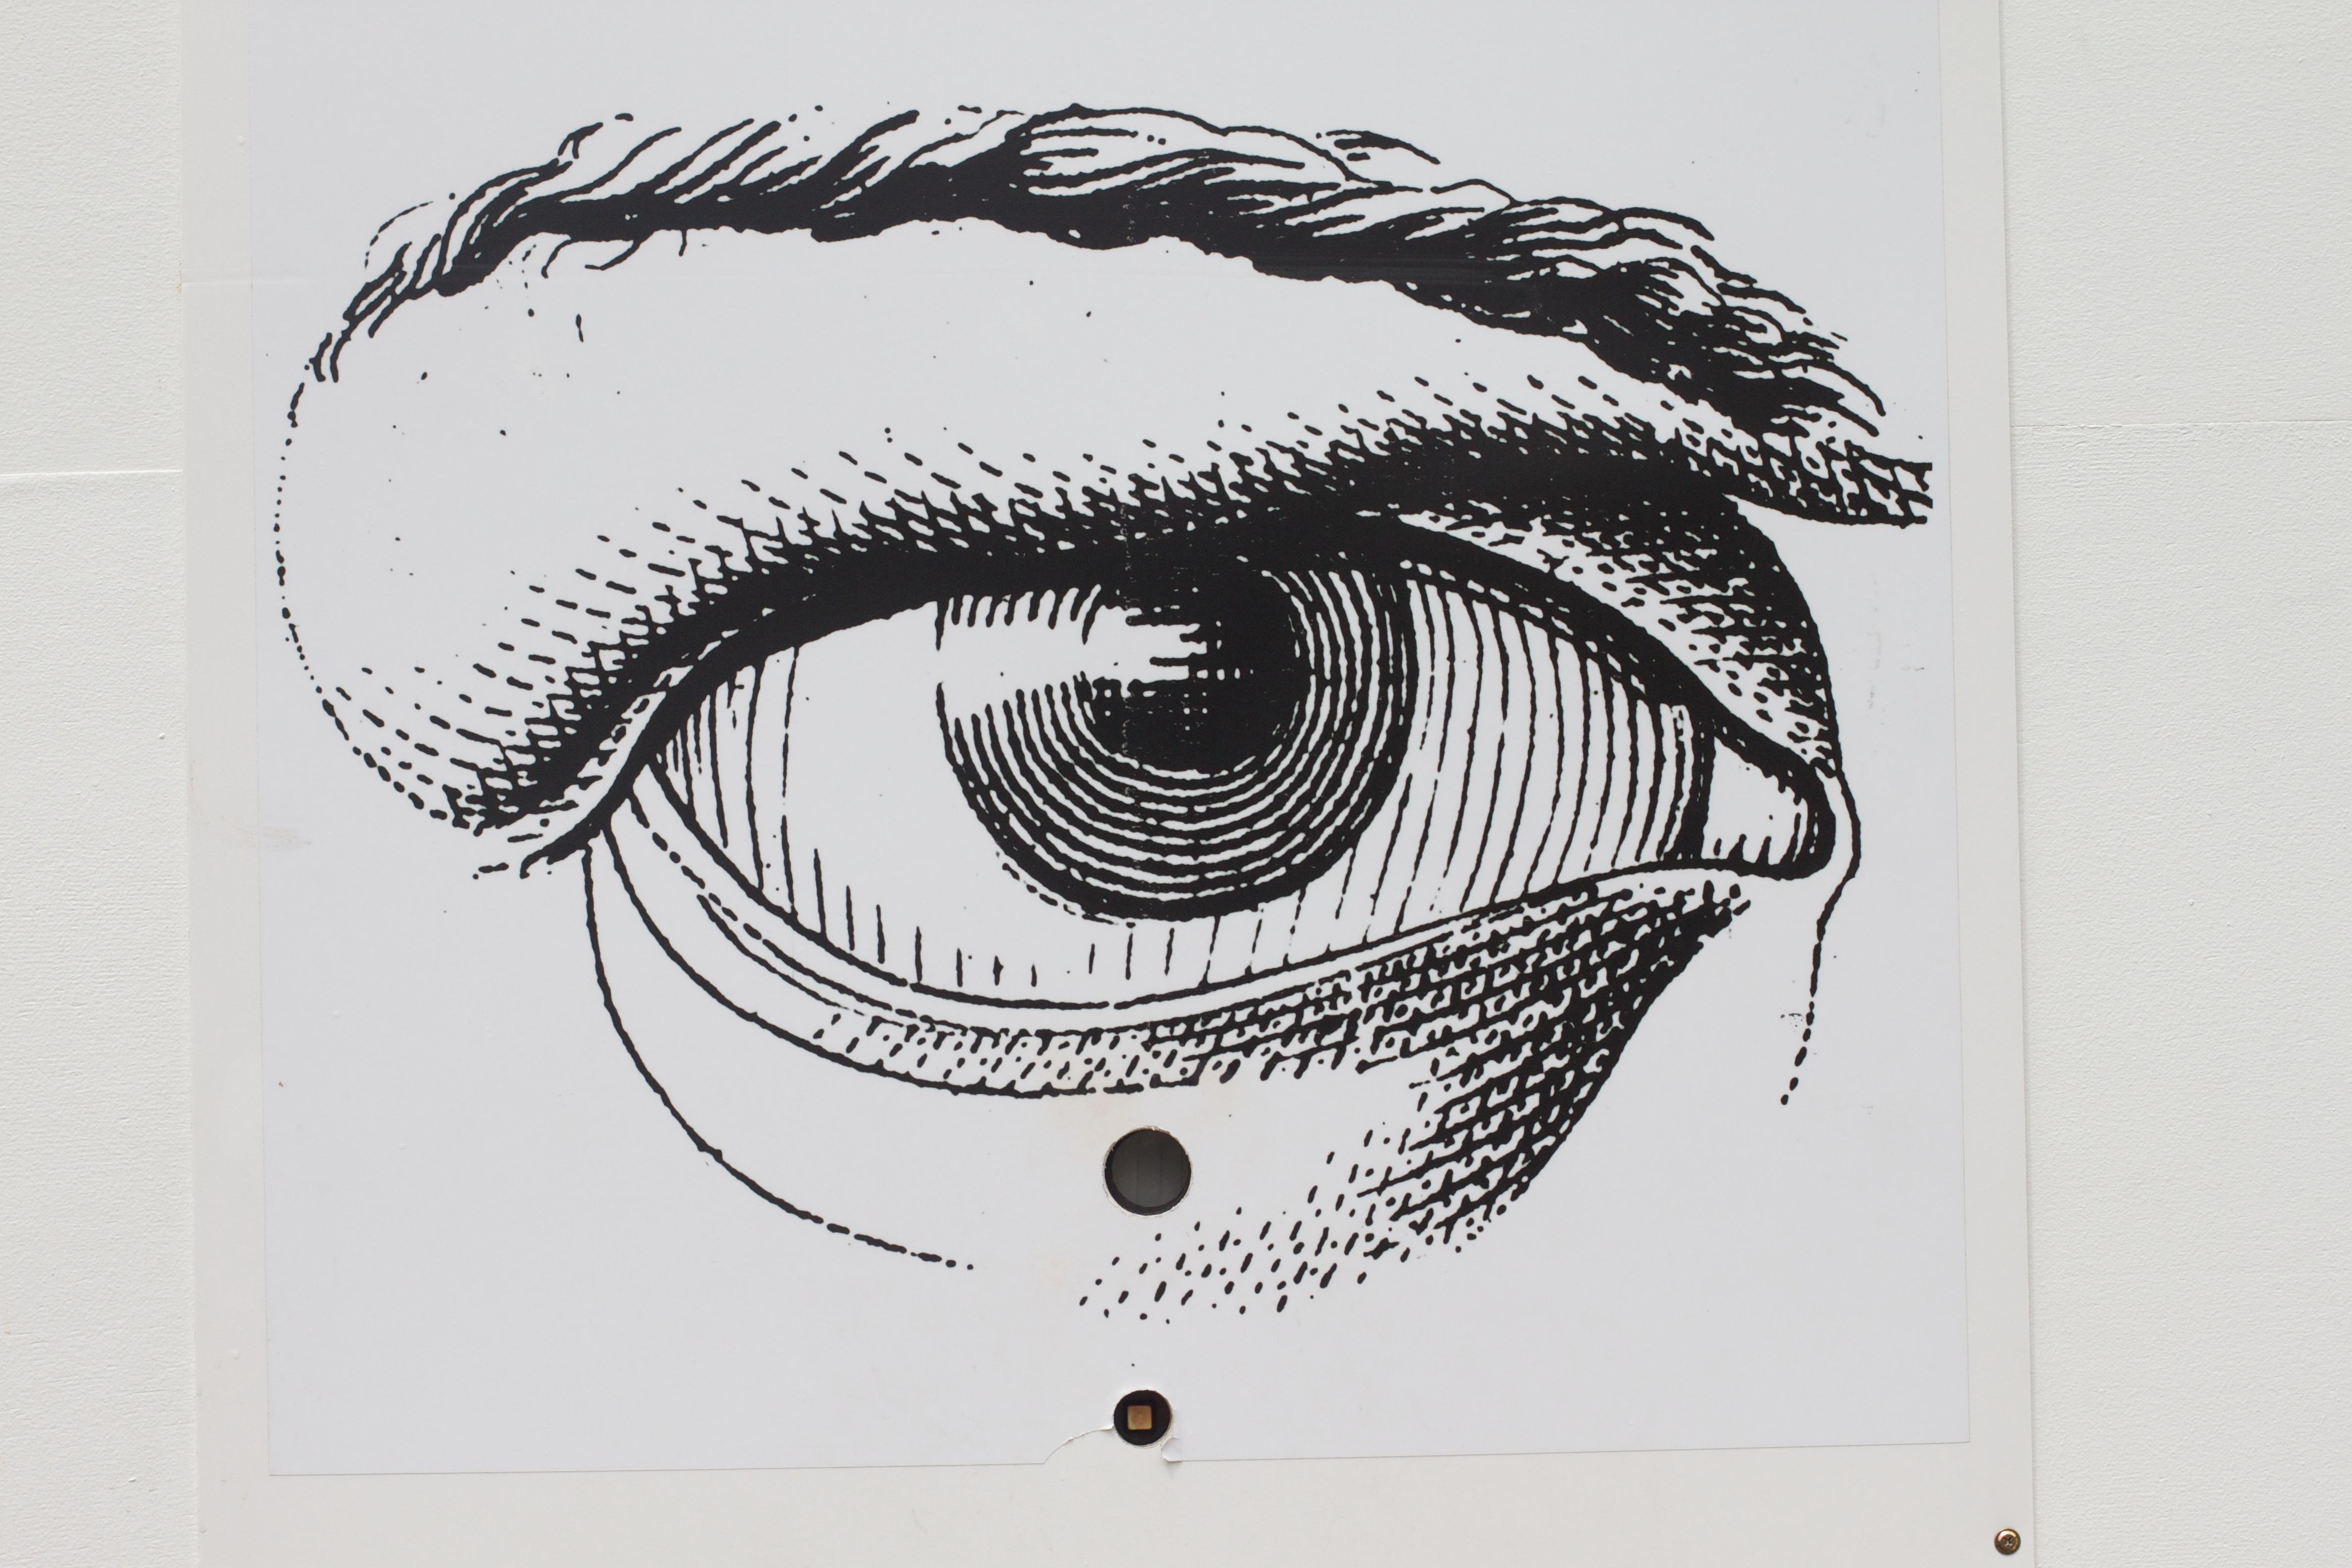 Gambar Sketsa Ilustrasi Mata Kepala Organ Gambar